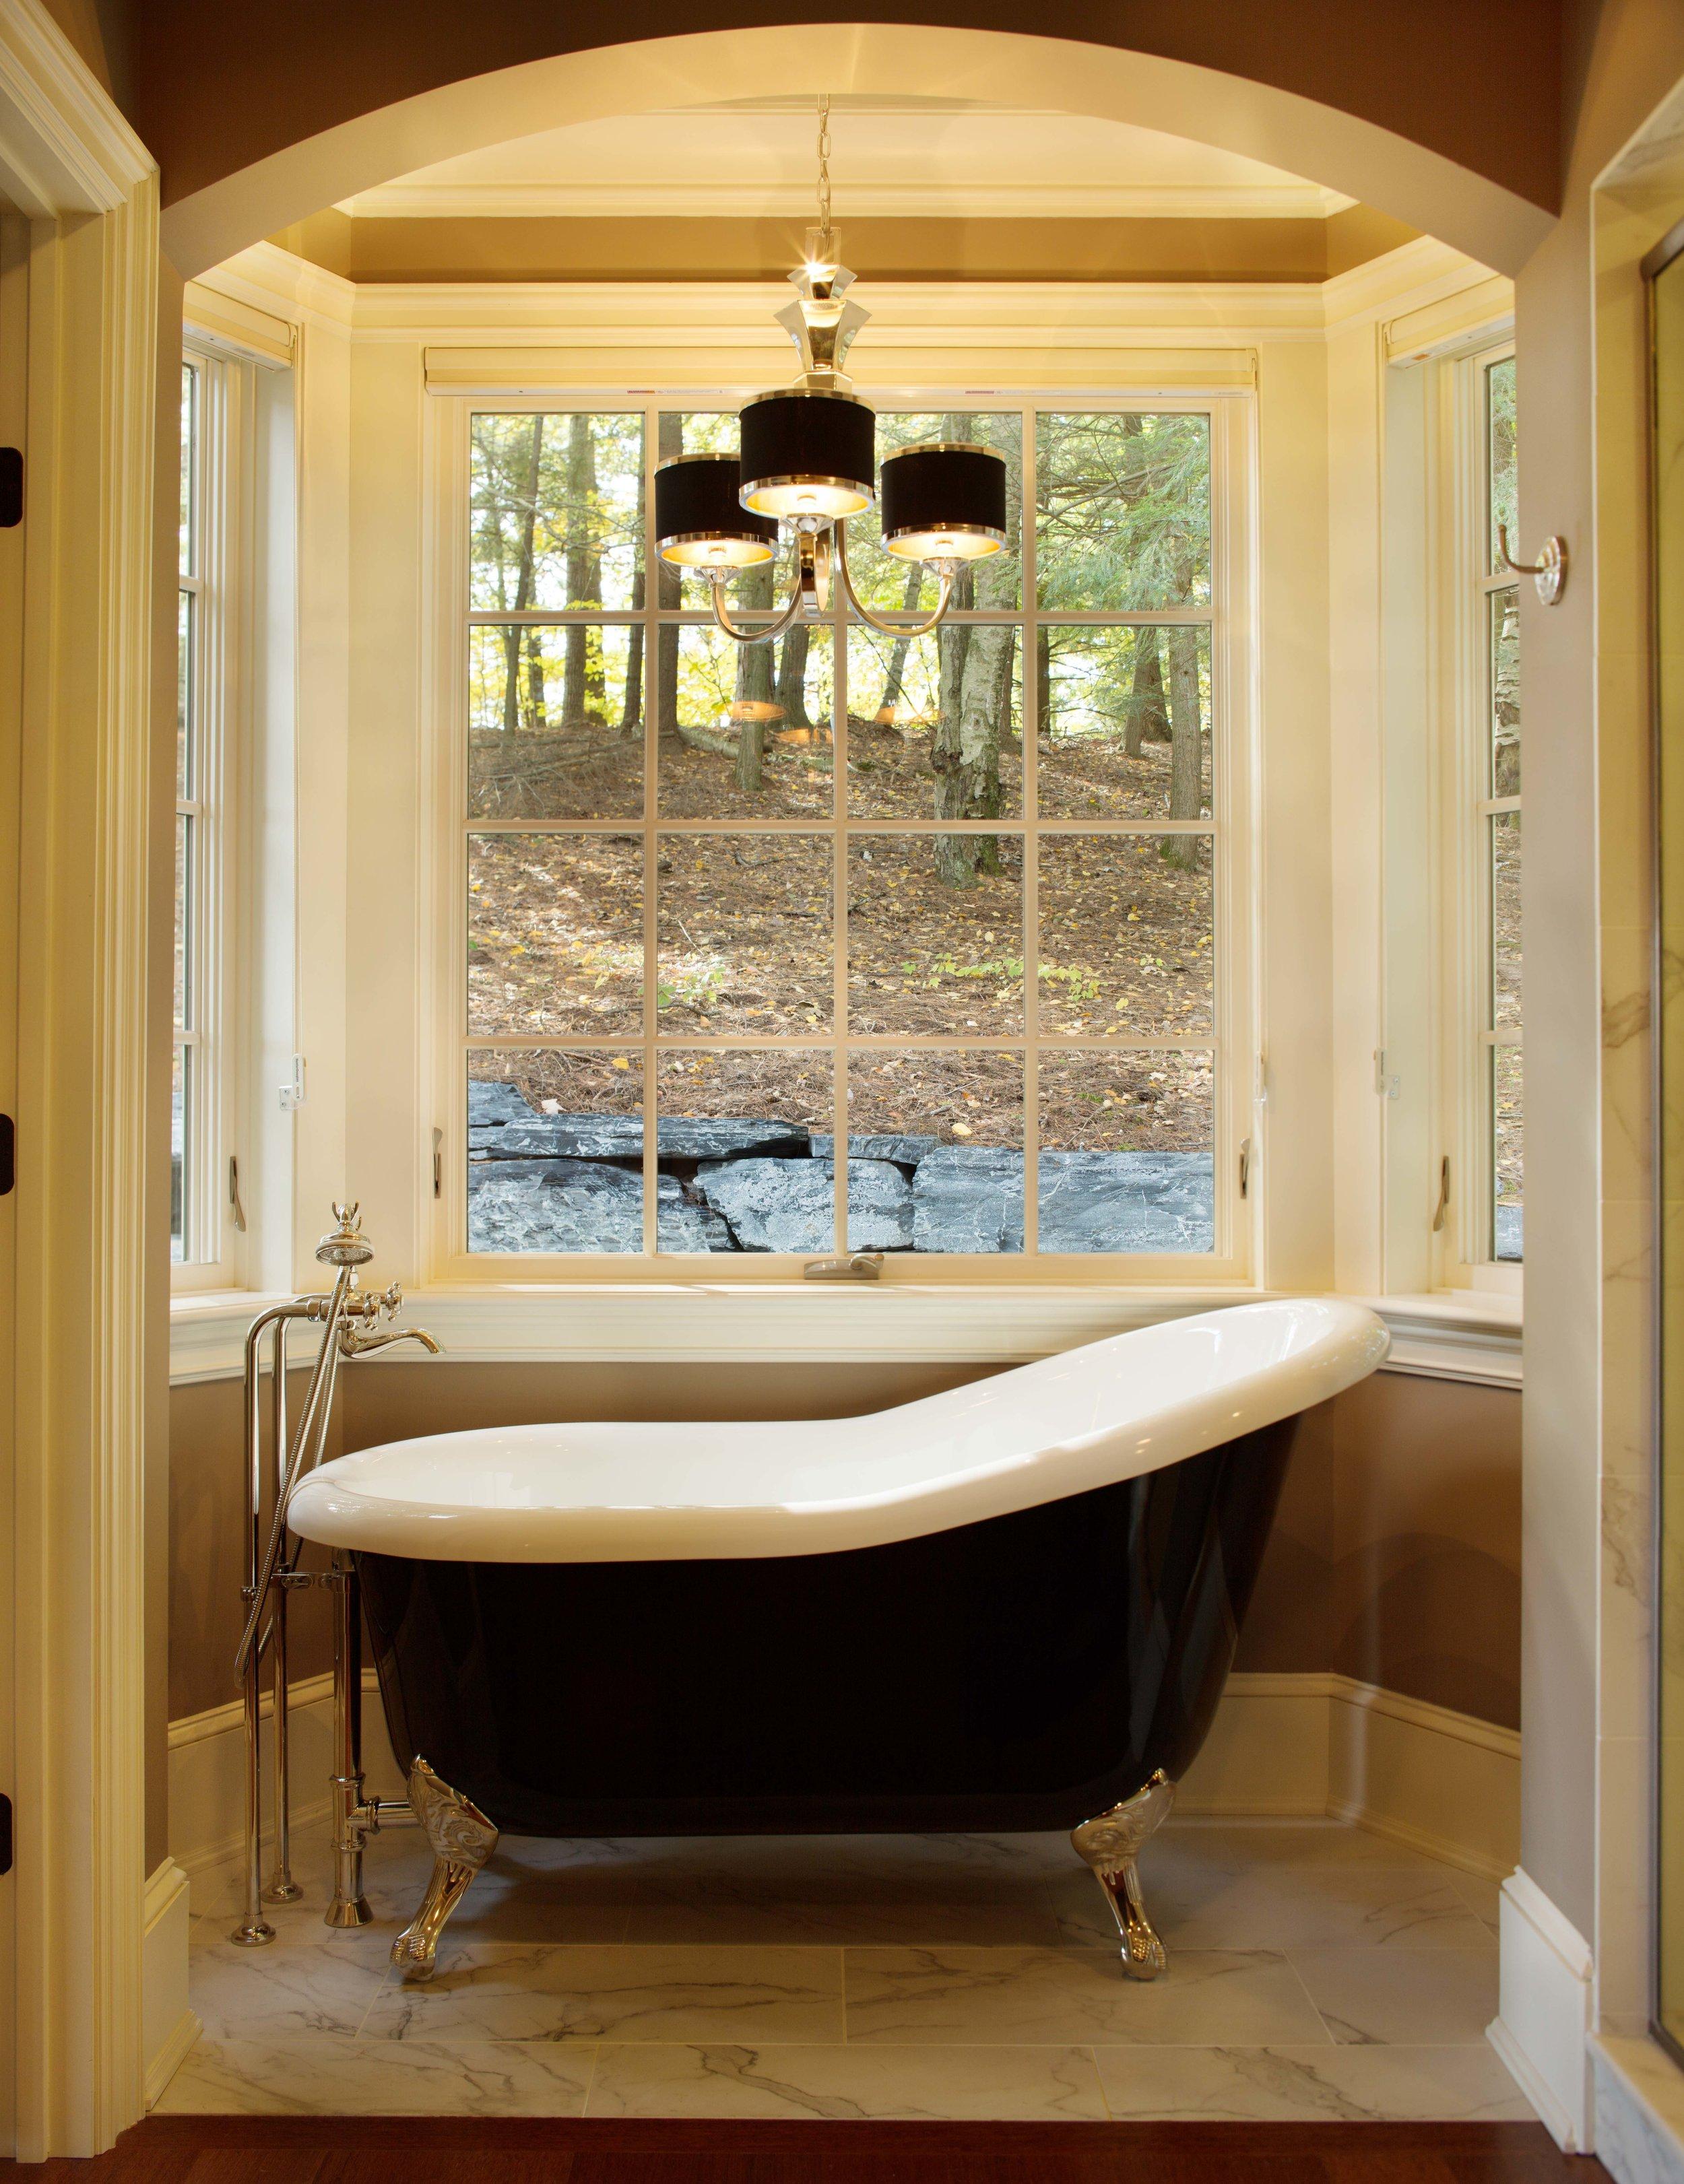 Corcoran-Master Bathroom 1.jpg